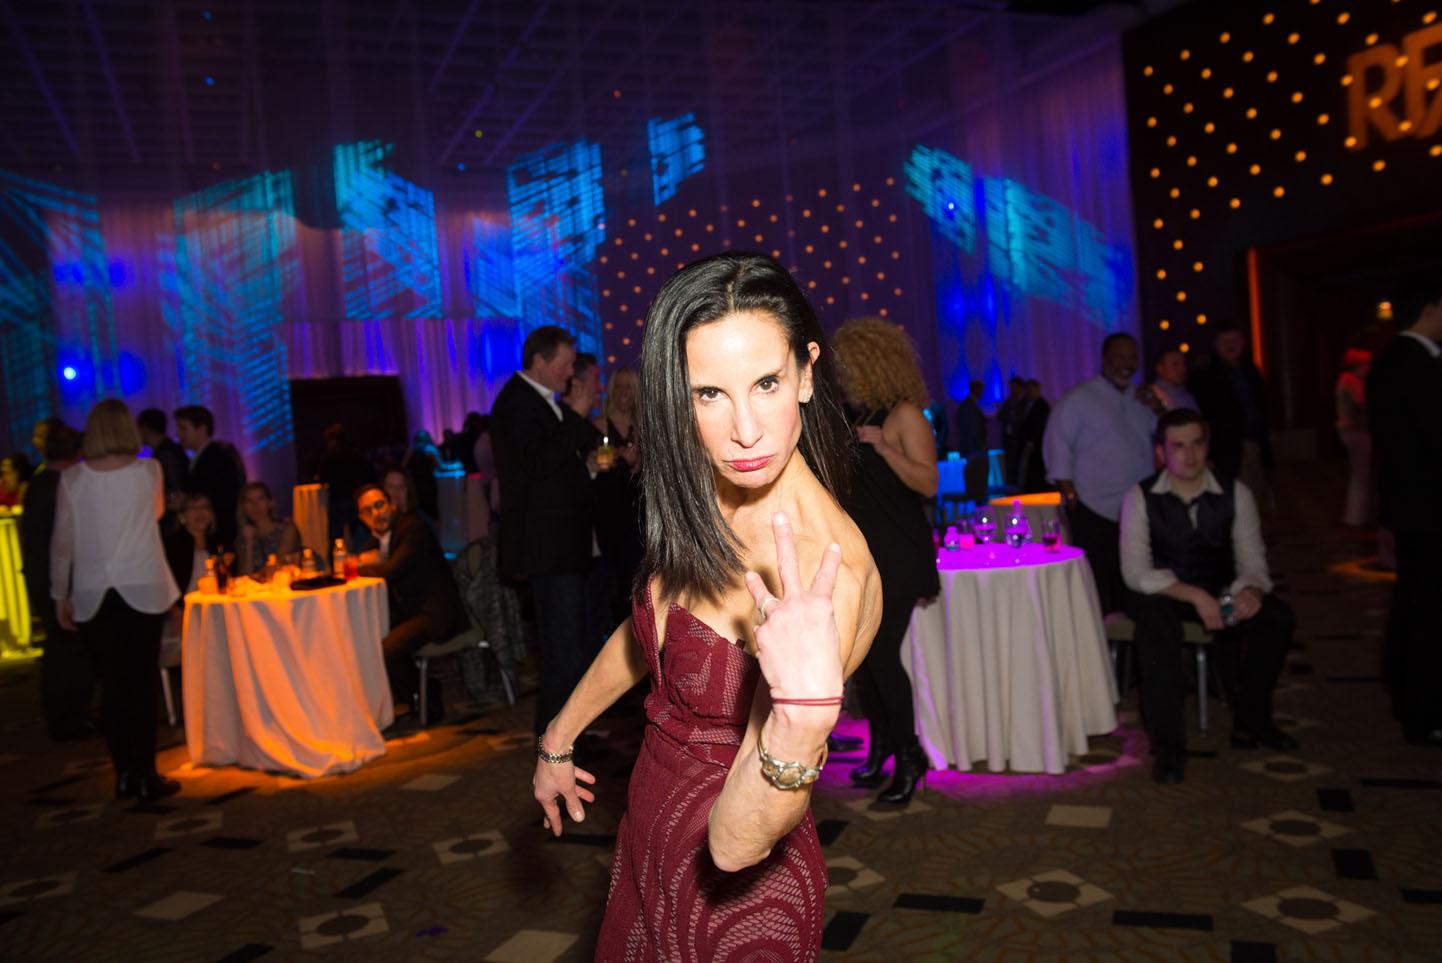 2015-12-09 ReMax Corpoarte Event - The Borgata - Atlantic City NJ - Photo Sesh - 2015-5294.jpg